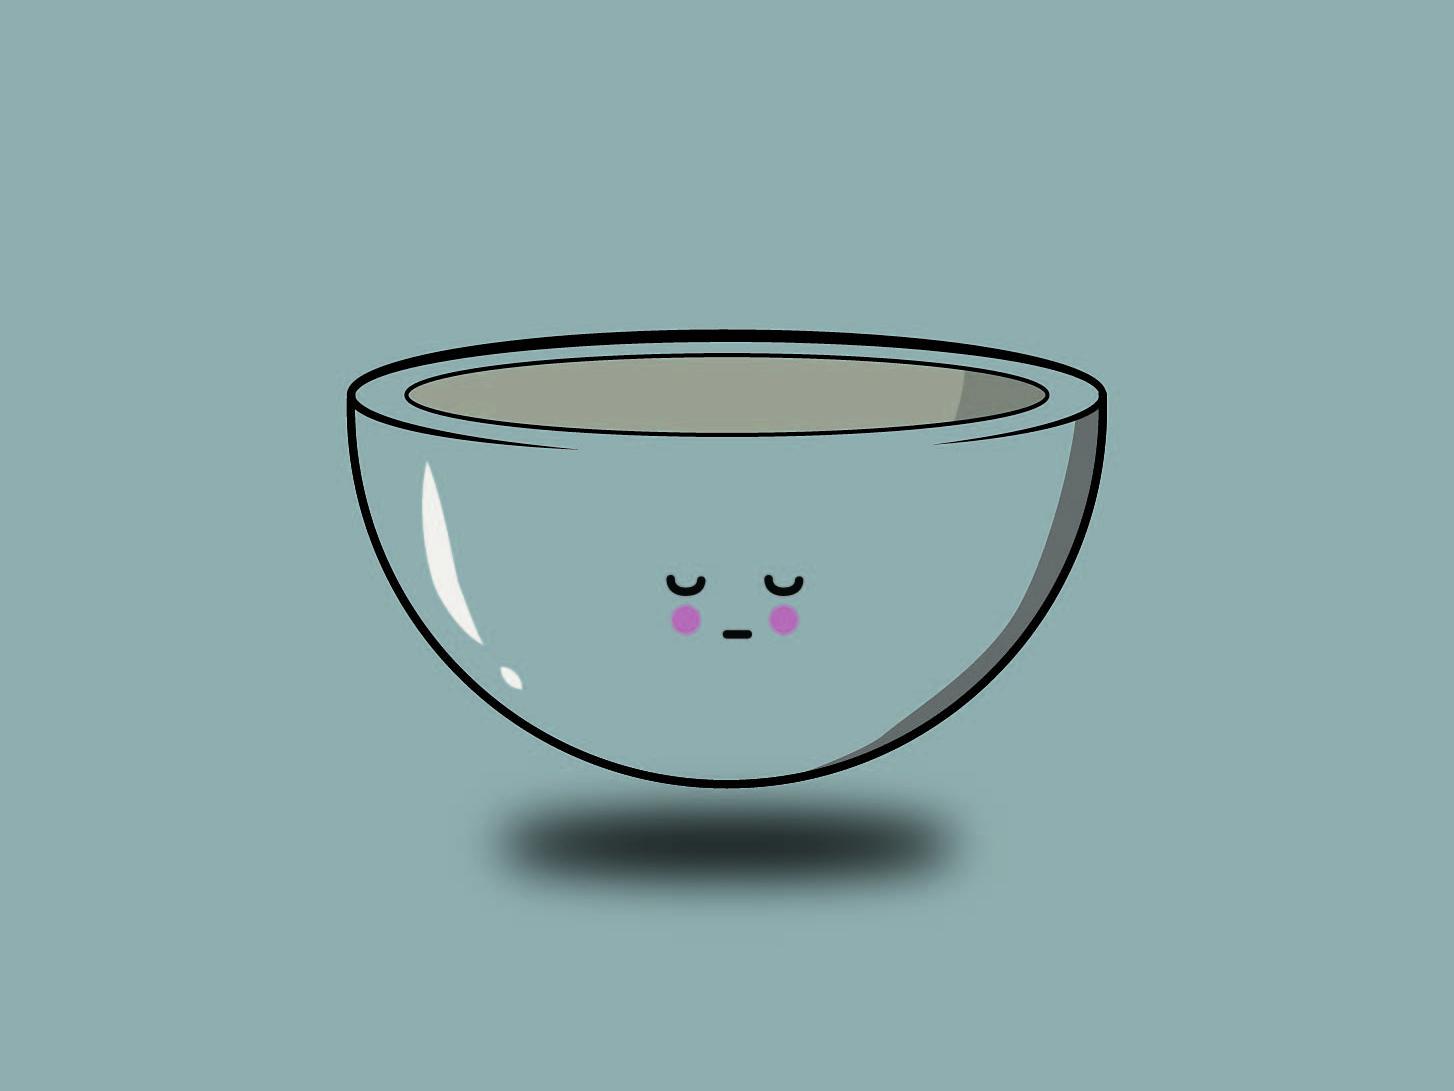 Bowl -  Quick illustrations graphics graphicdesign illustrator vector illustration design